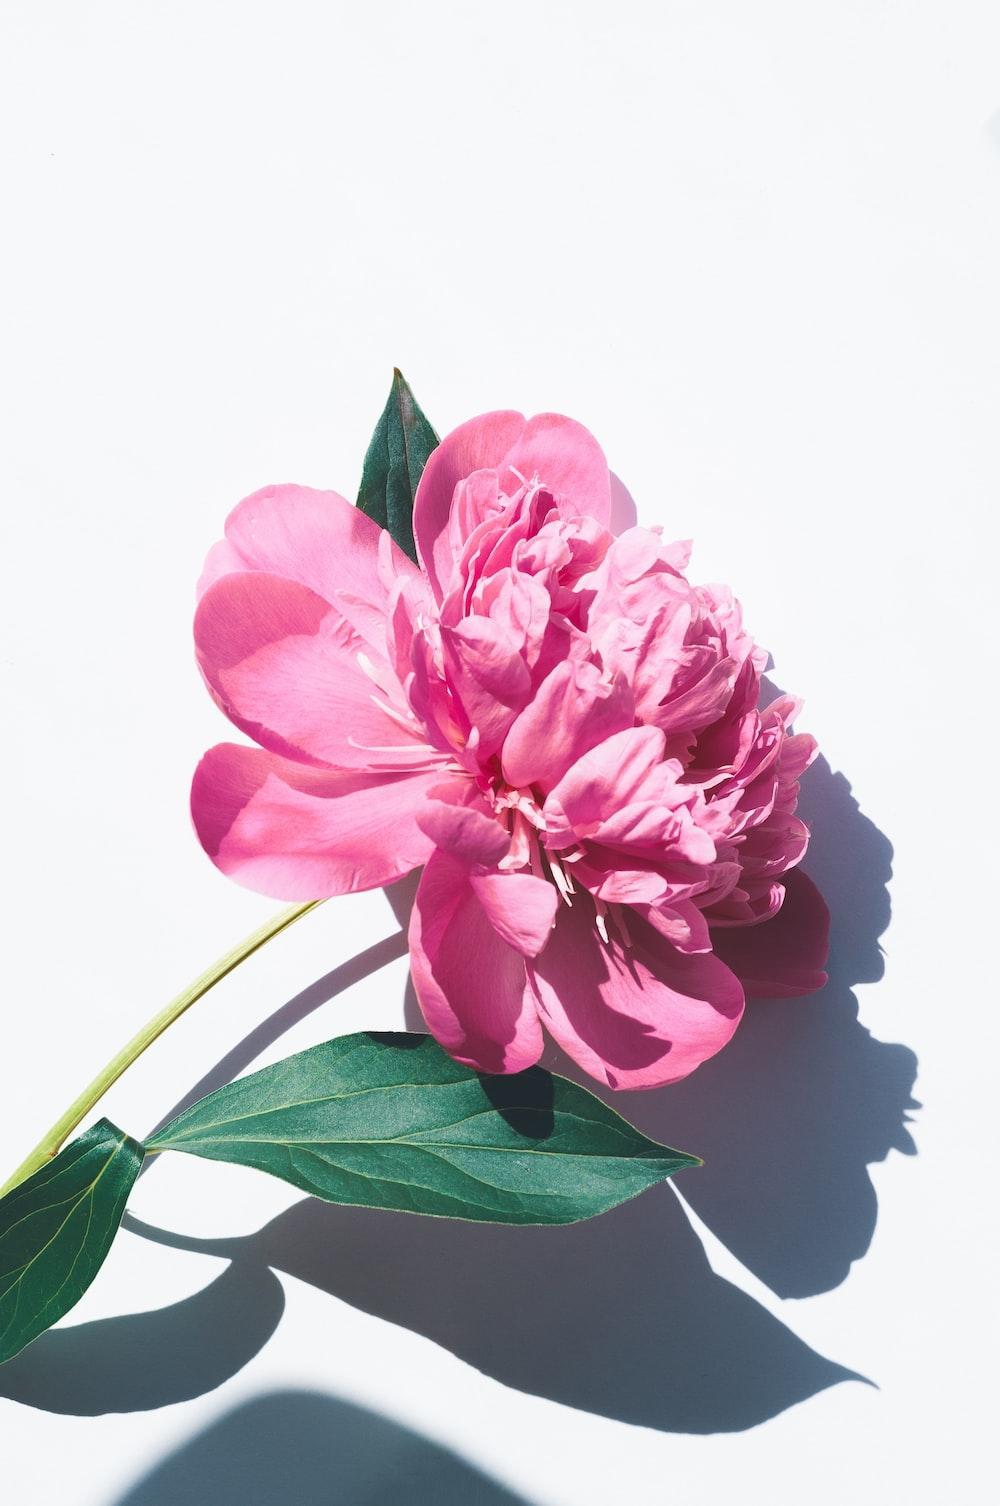 Flower Wallpapers Free Hd Download 500 Hq Unsplash